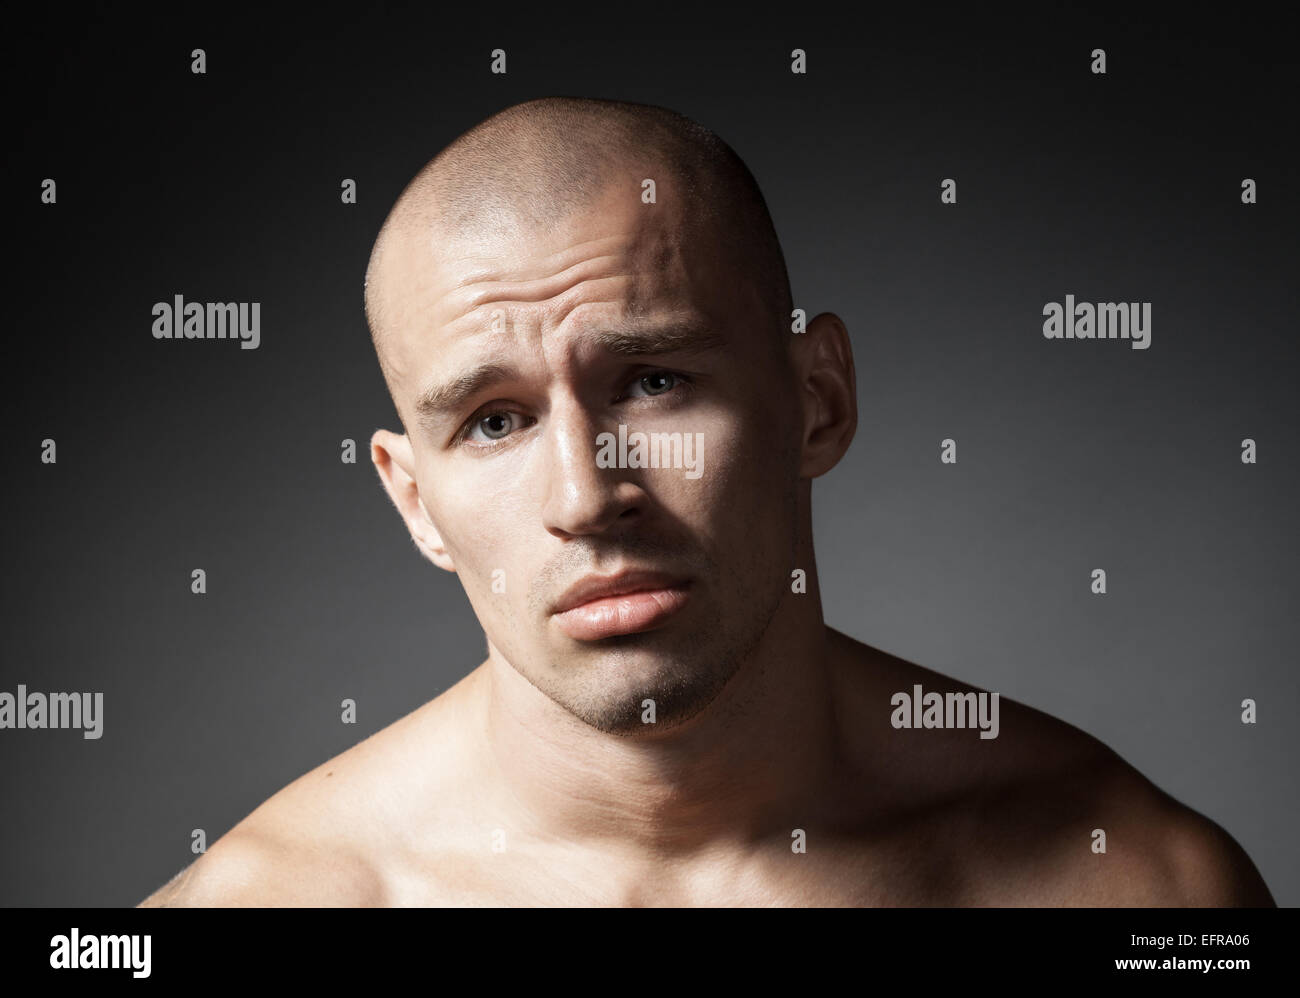 Retrato de Miserable hombre fuerte aislado sobre fondo gris Imagen De Stock